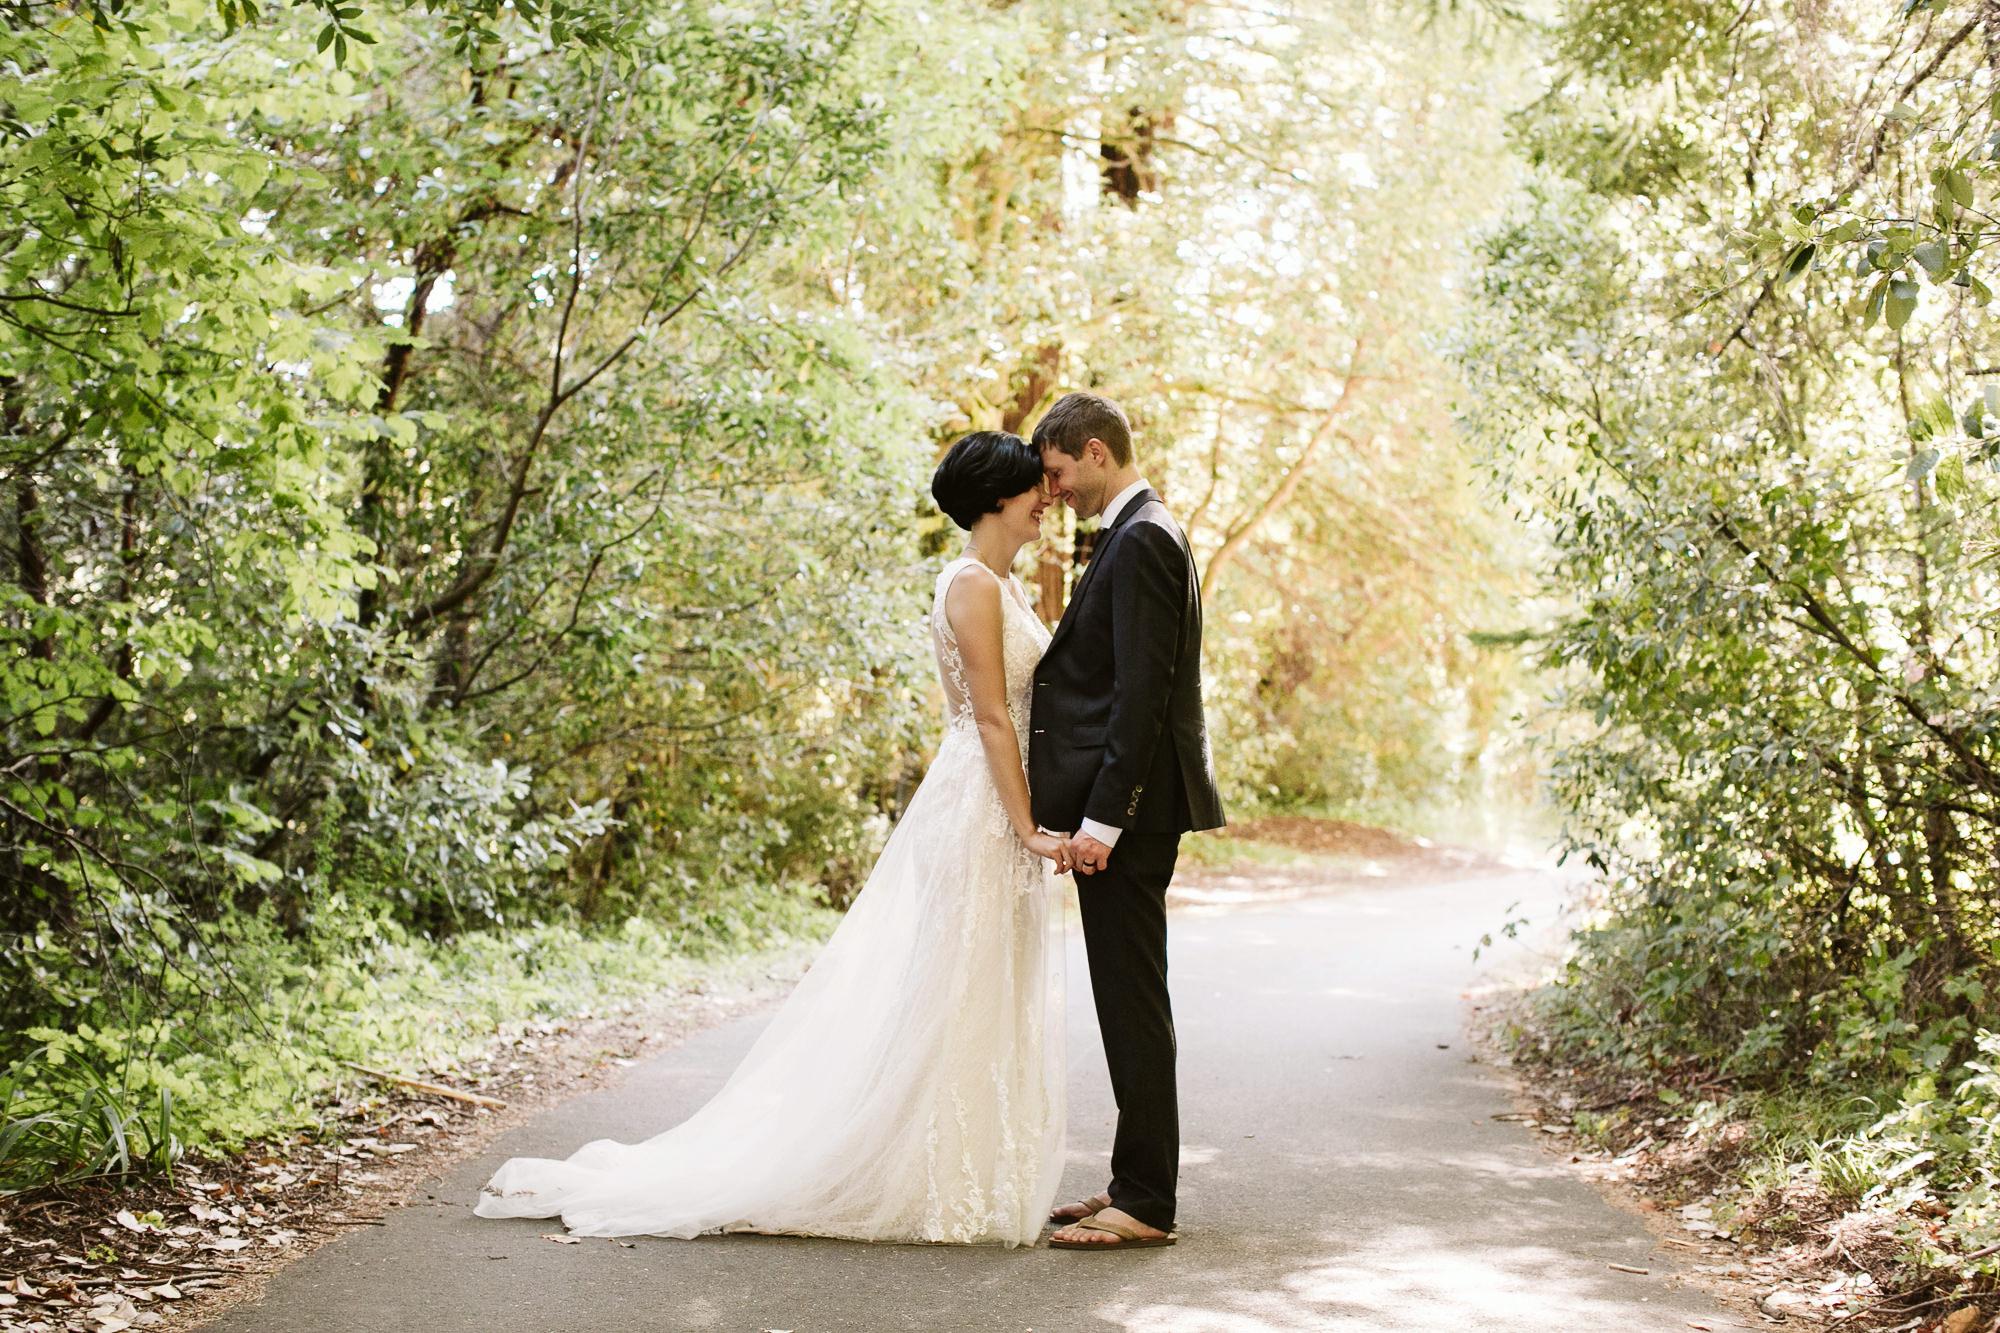 California-wedding-photographer-alfonso-flores-pamplin-groove-252.jpg